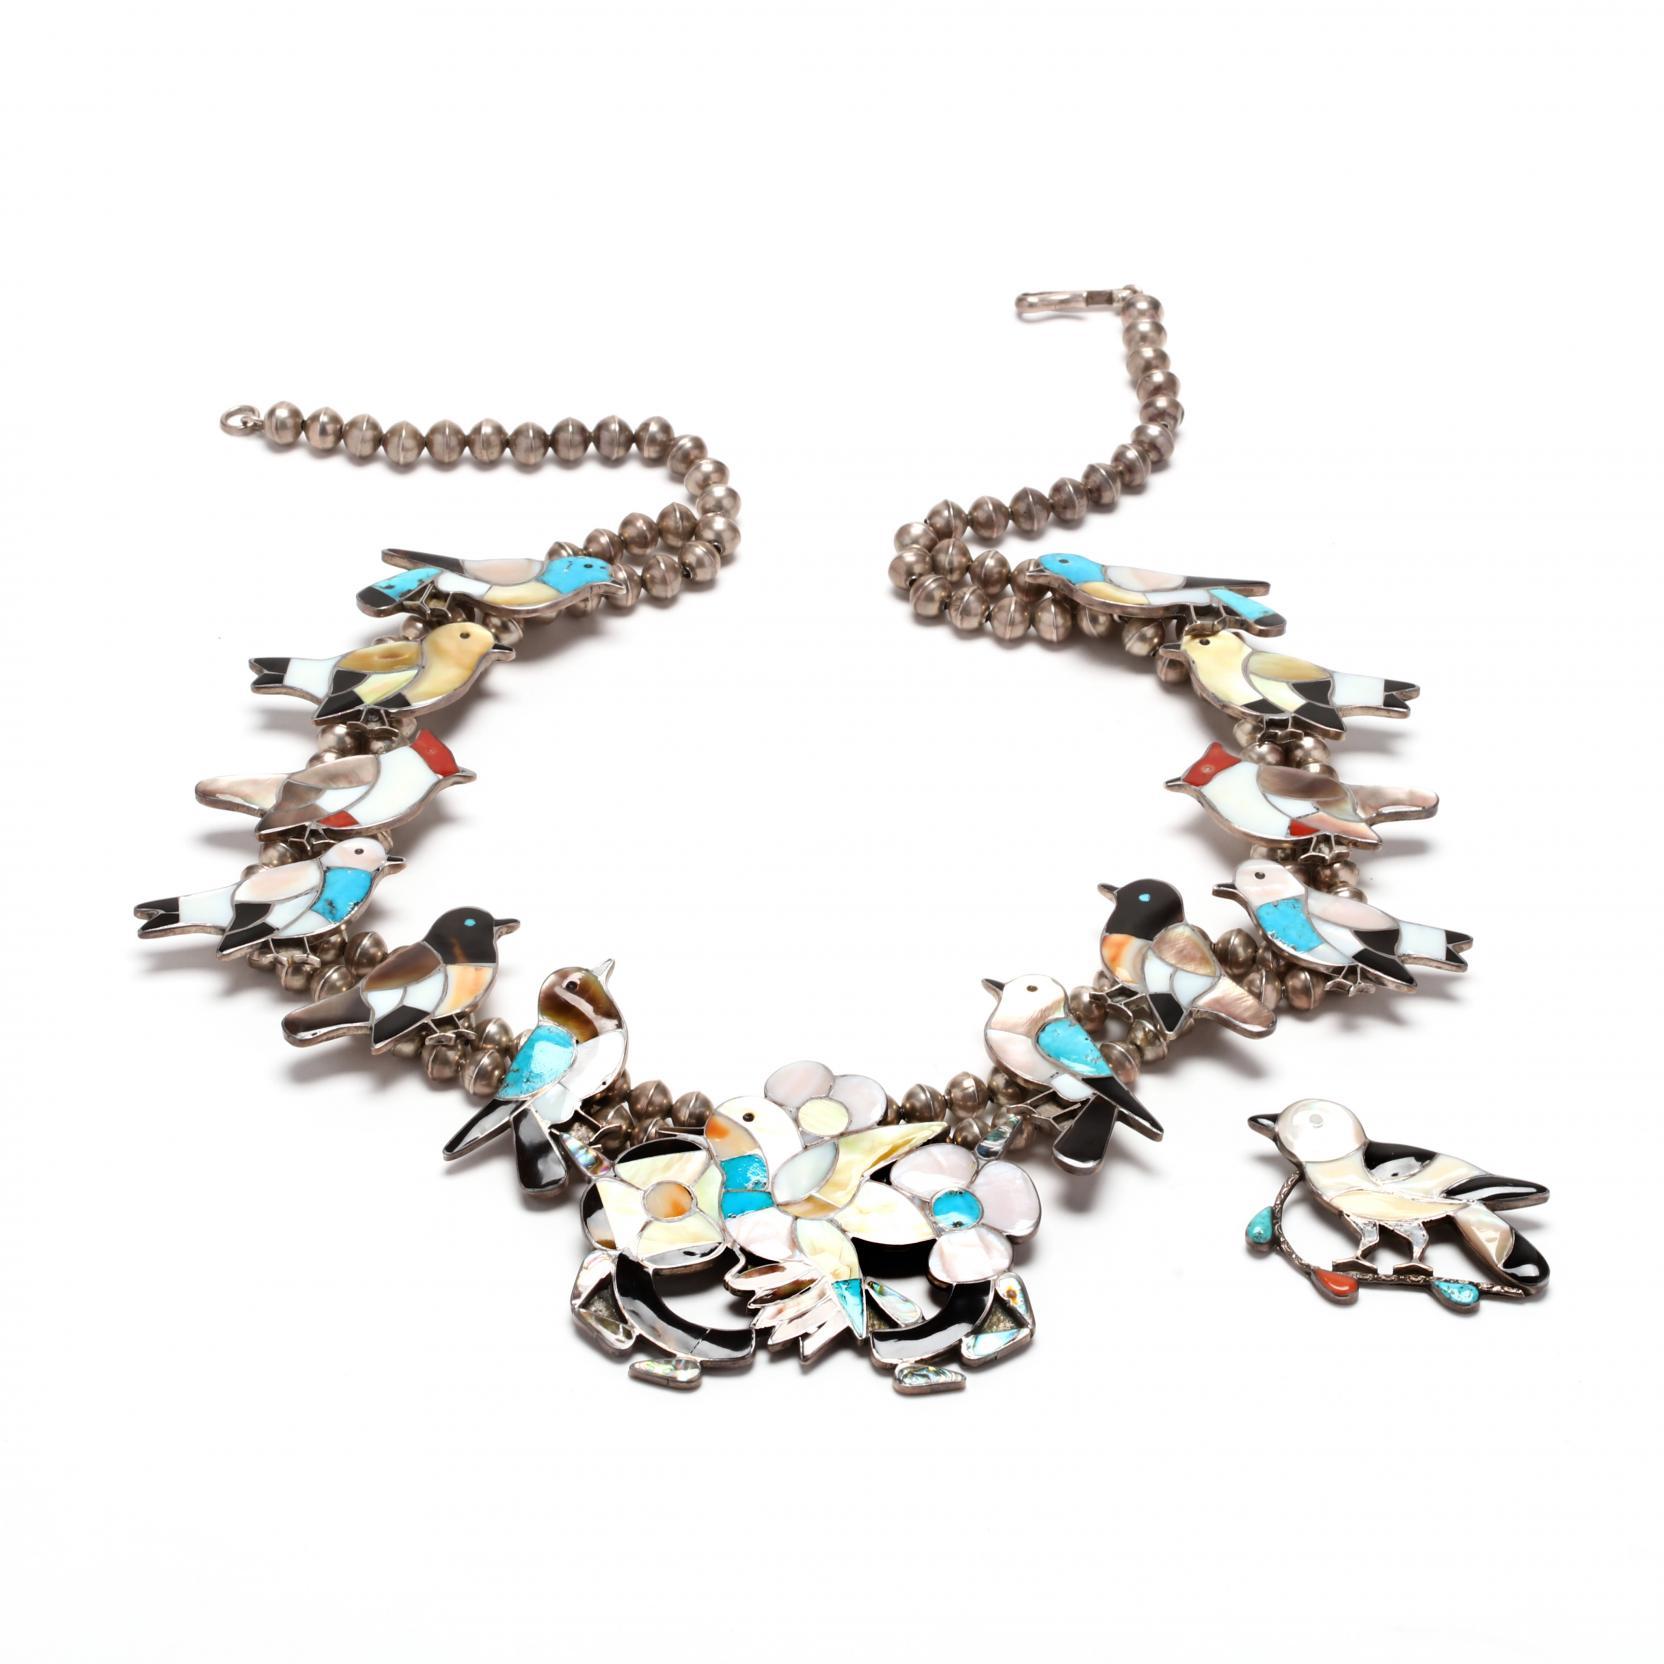 southwestern-silver-multi-stone-bird-motif-squash-blossom-necklace-and-brooch